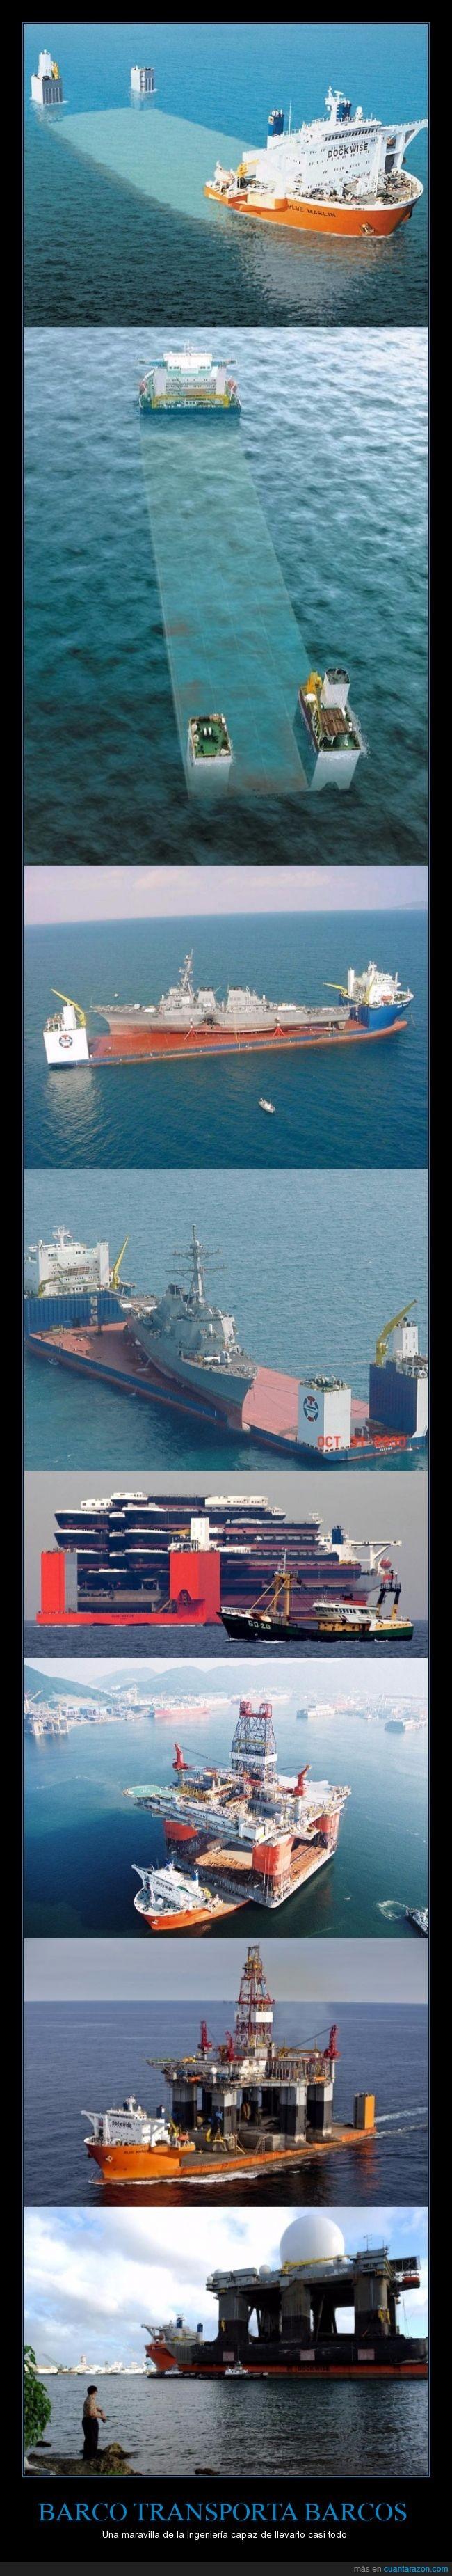 barco,barcos,buque,gigante,transporta